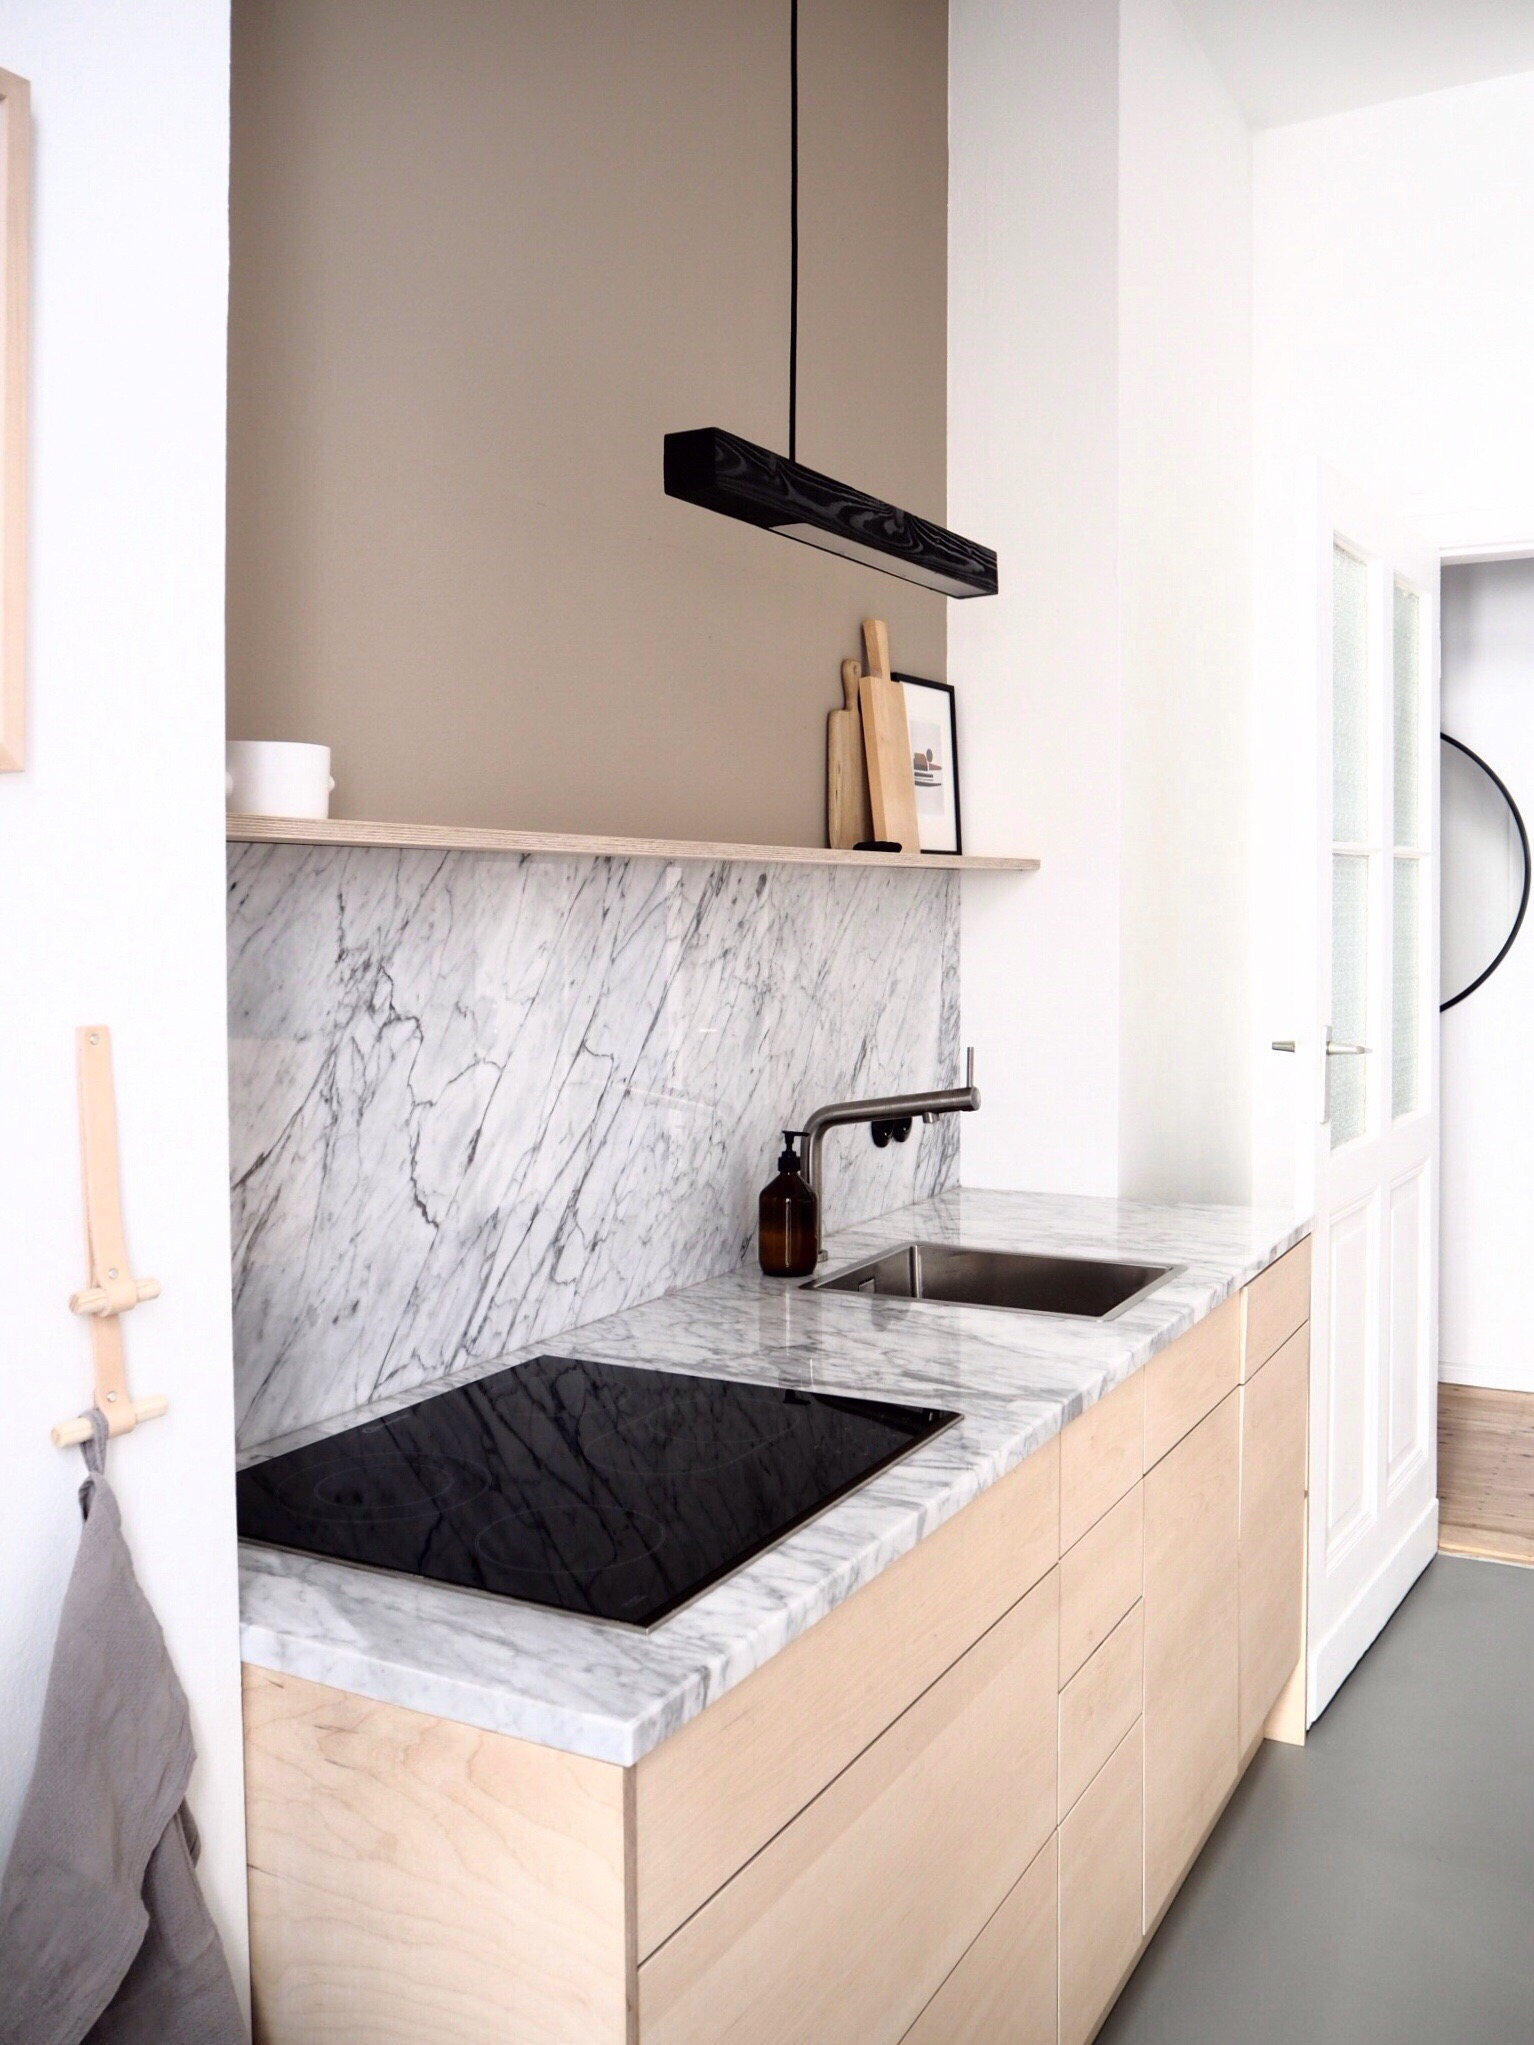 Selina Lauck- home tour - kitchen